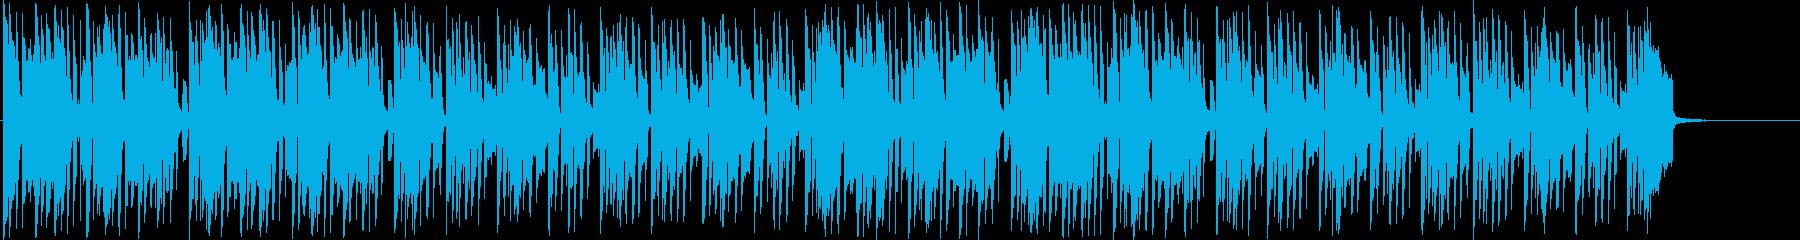 HIP HOP 風 EDM OP ED の再生済みの波形